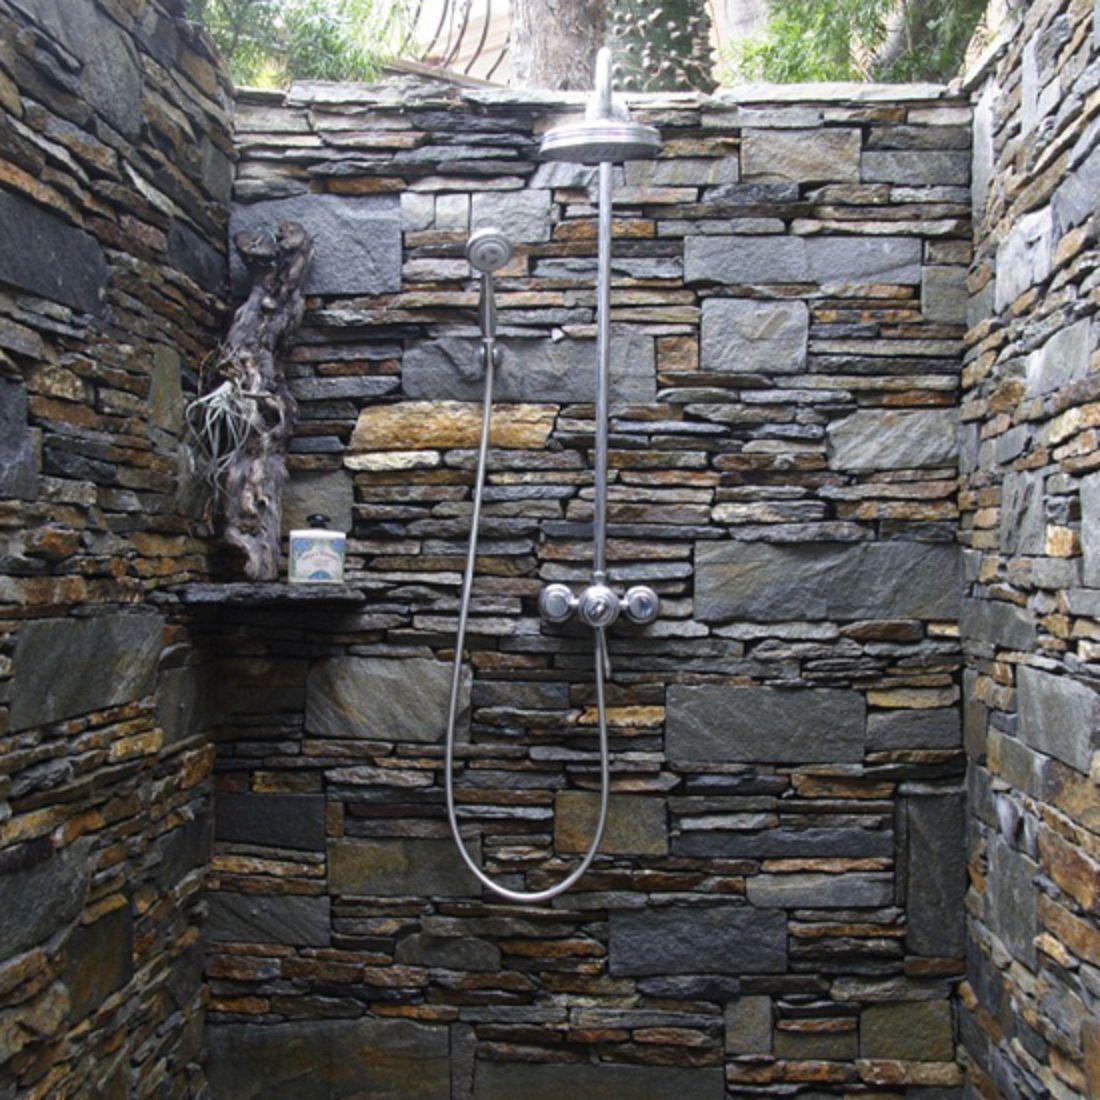 Luxury Outdoor Showers To Update Your Backyard 02 Luxury outdoor showers Luxury Outdoor Showers To Update Your Backyard Luxury Outdoor Showers To Update Your Backyard 02